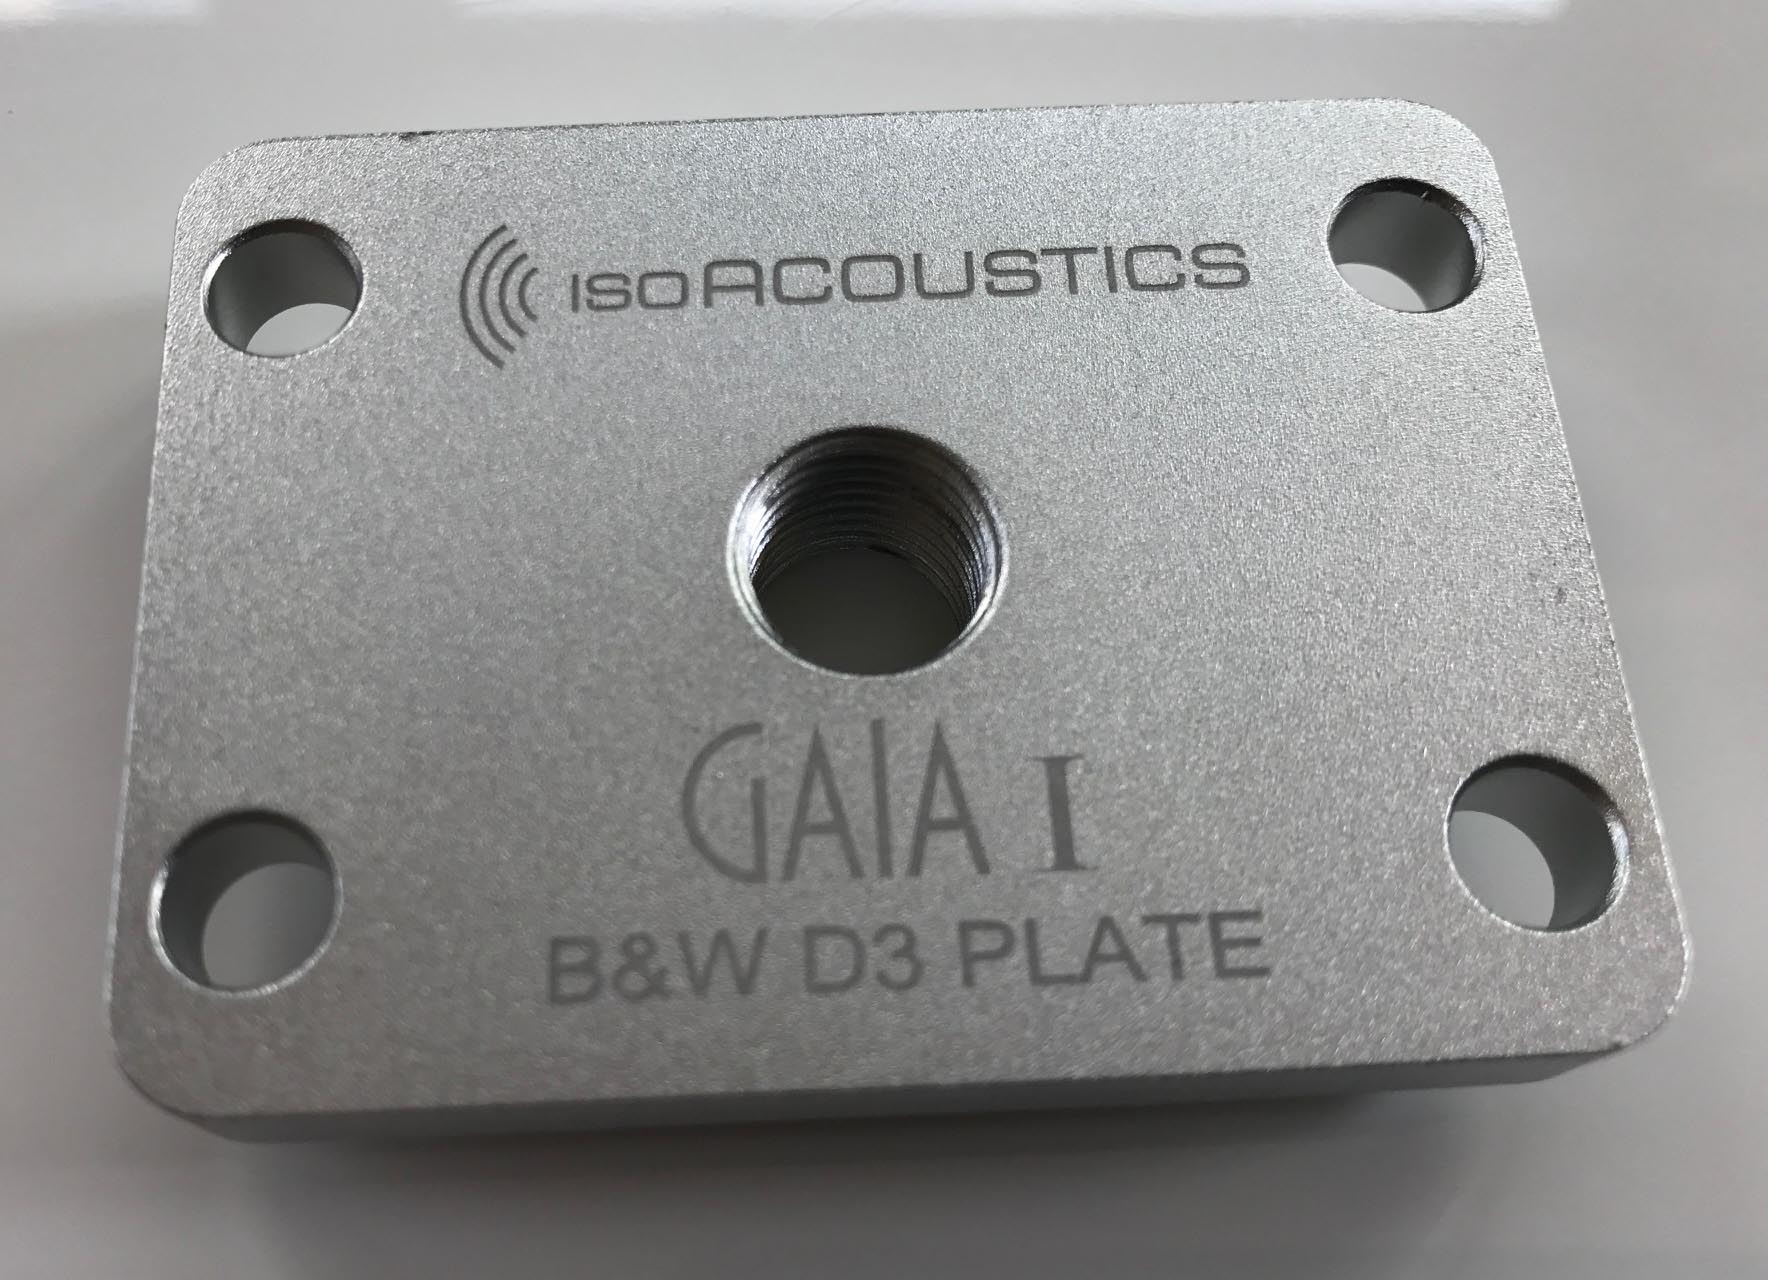 B&W D3 Plate Top